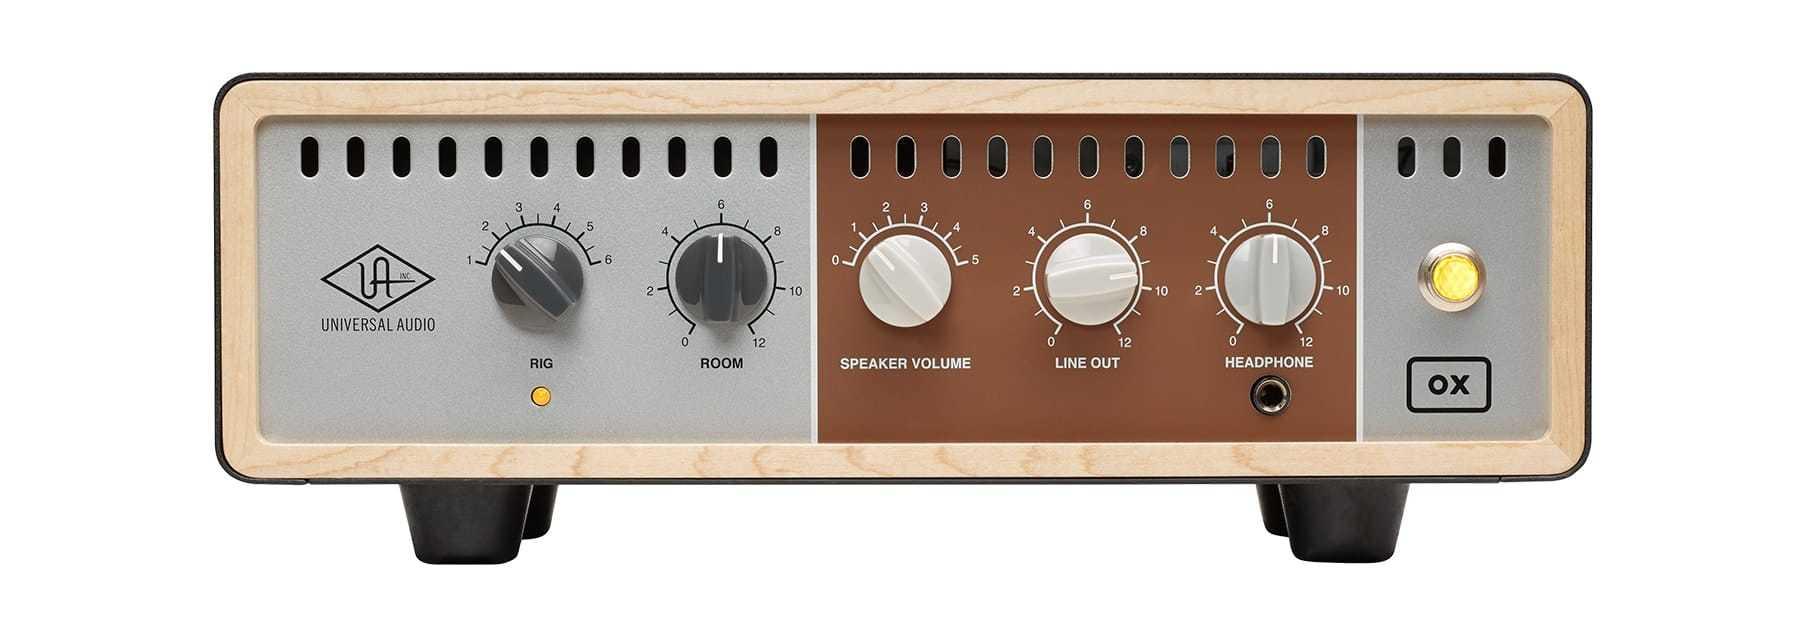 Ox Amp Top Box.jpg